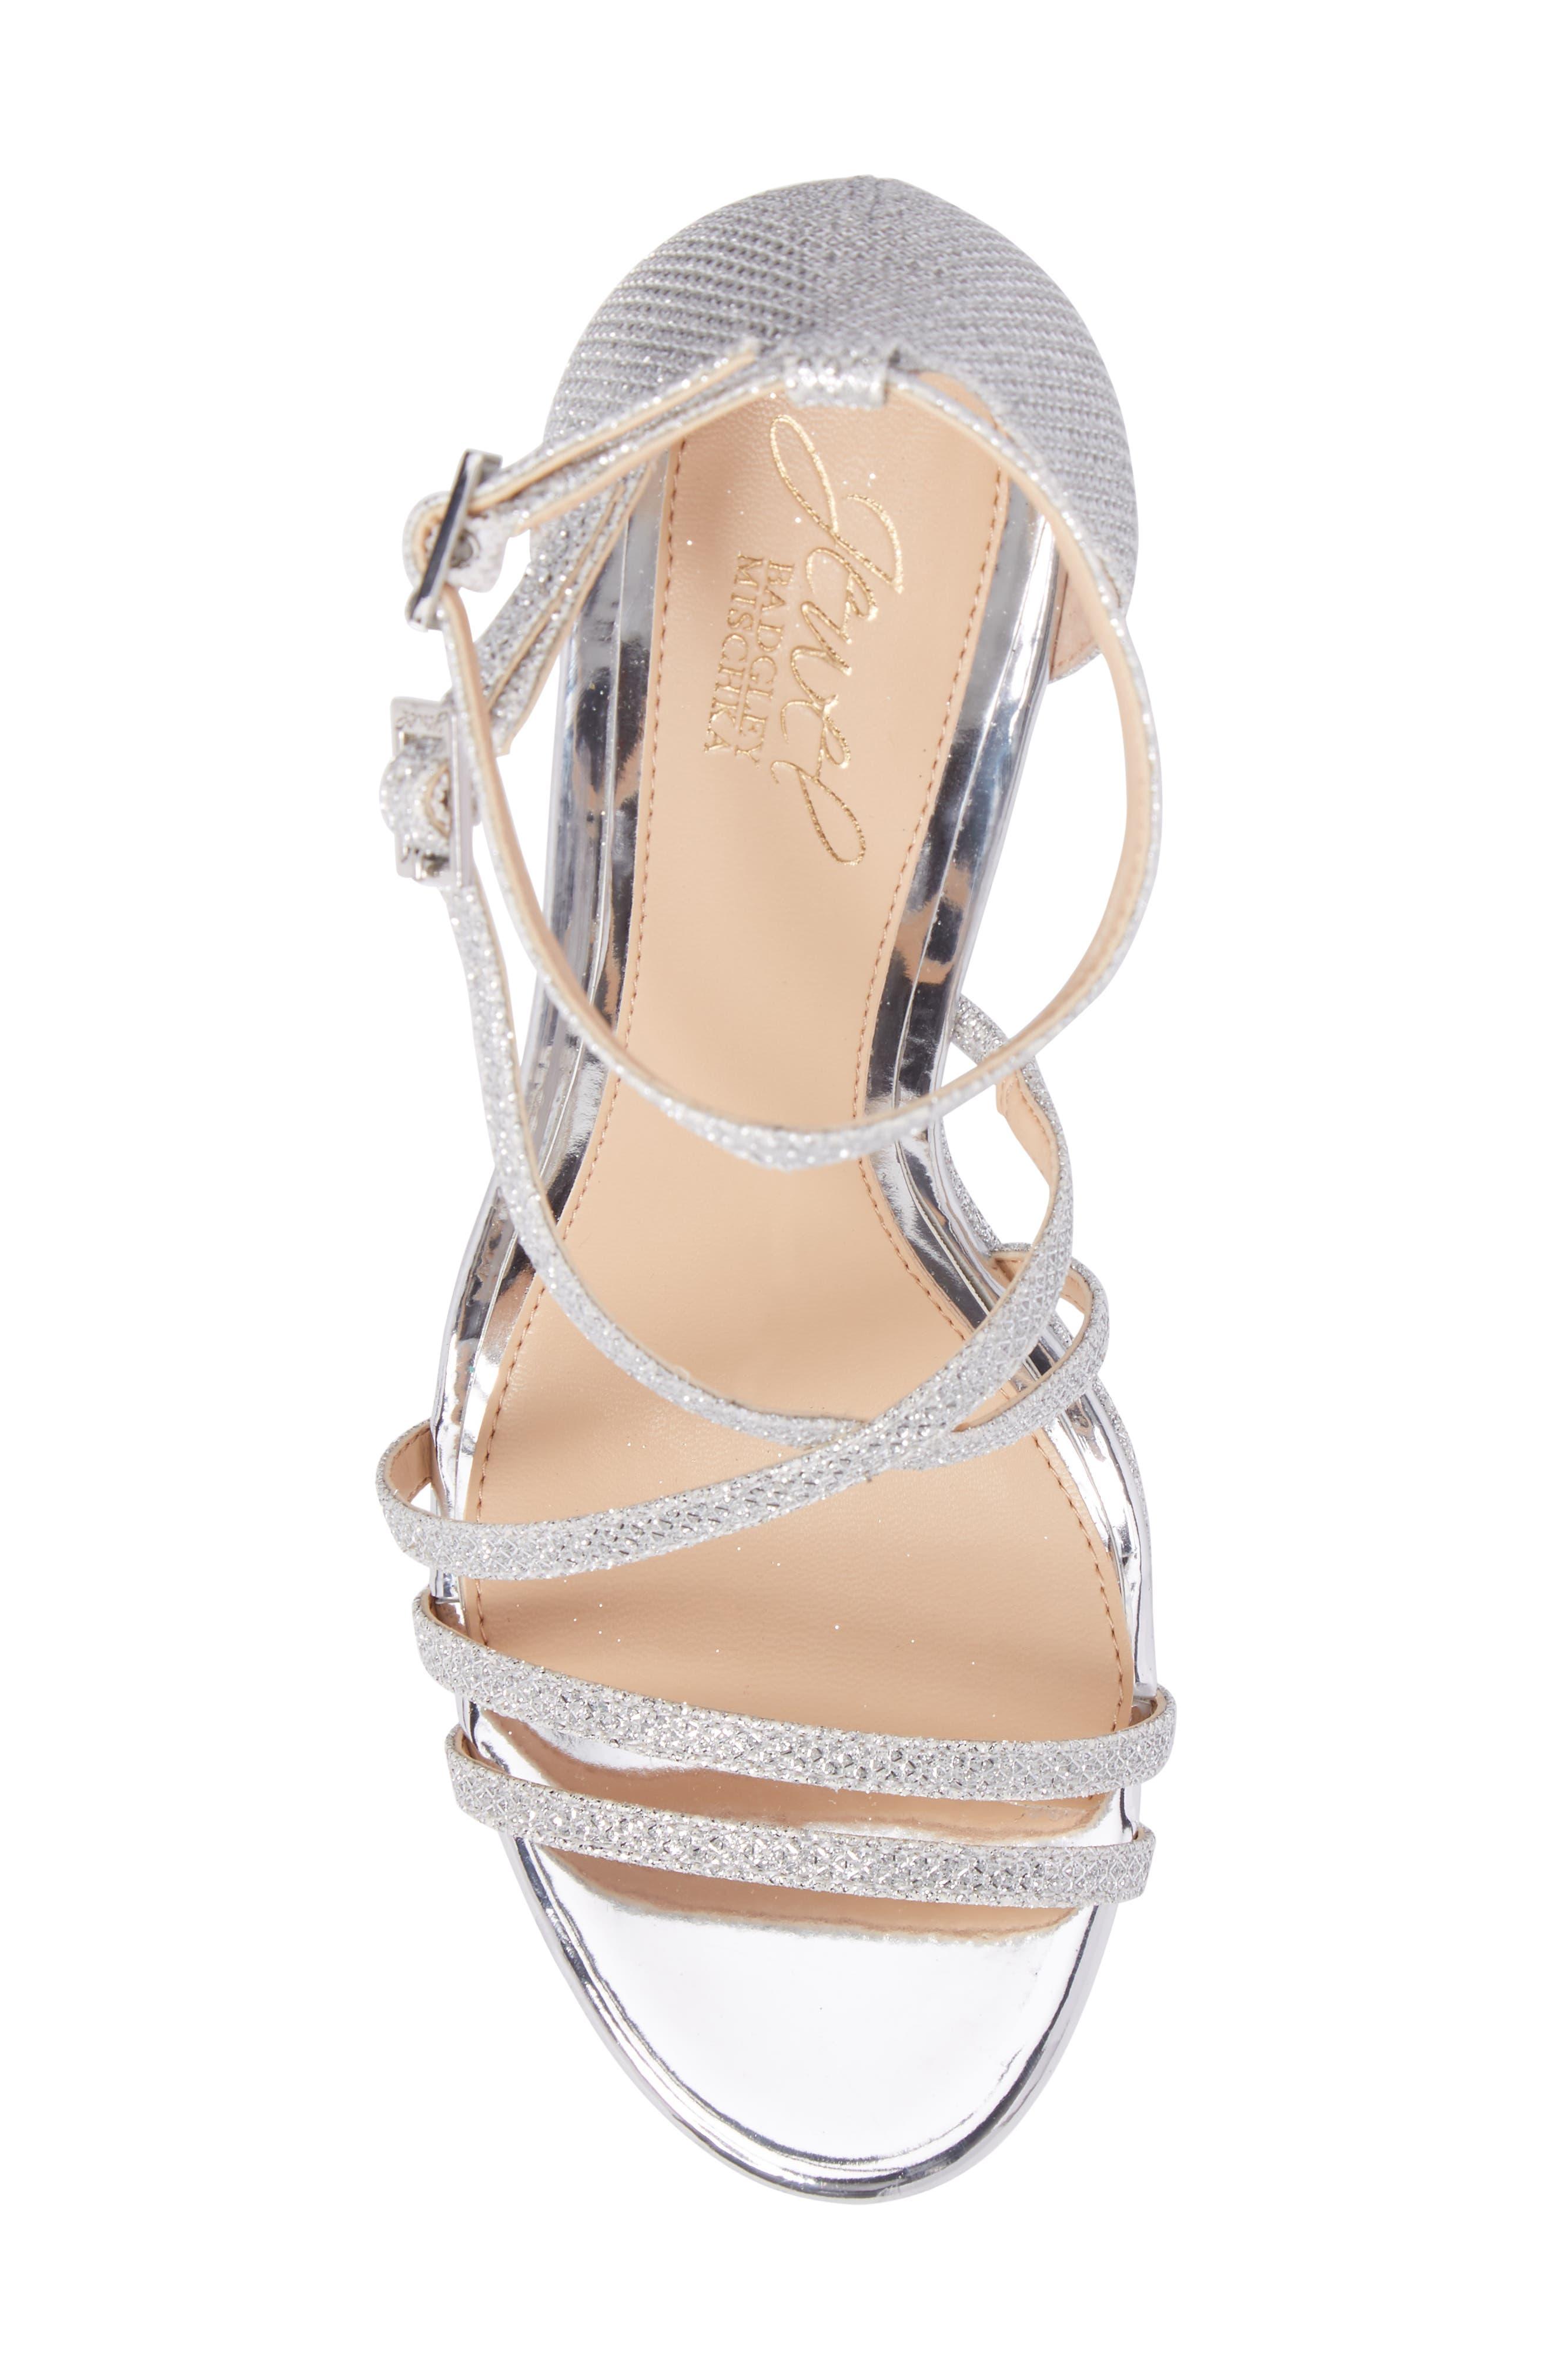 Tatsu Wedge Sandal,                             Alternate thumbnail 5, color,                             Silver Glitter